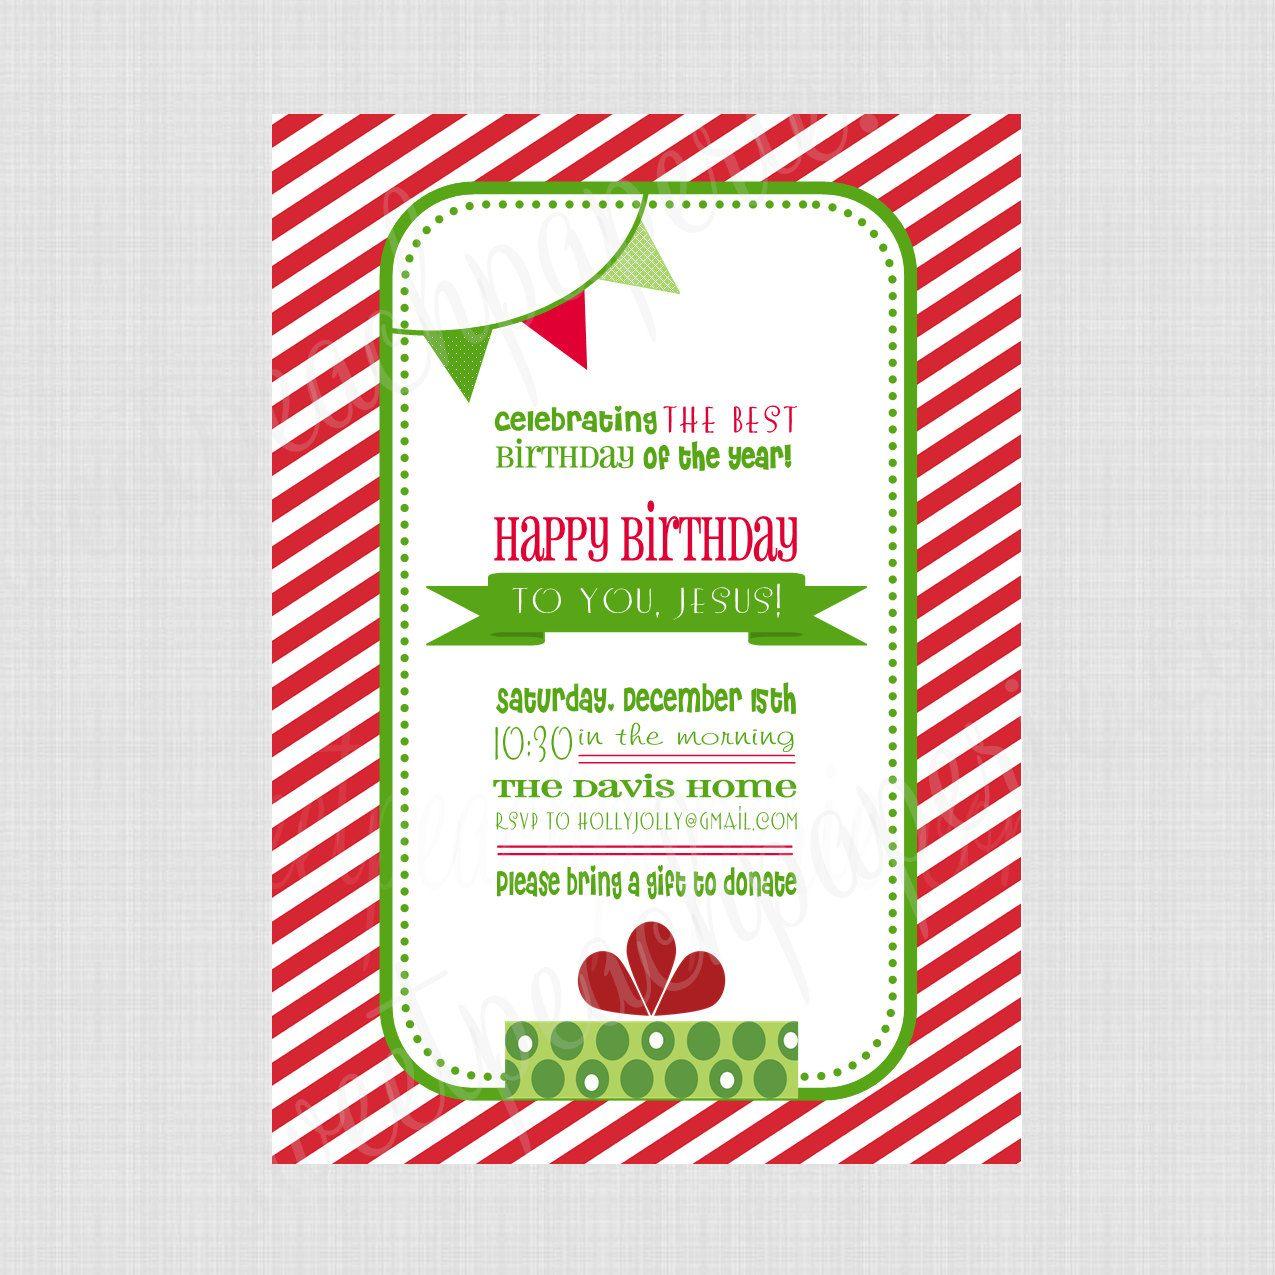 Happy Birthday Jesus Printable Invitation (Professional